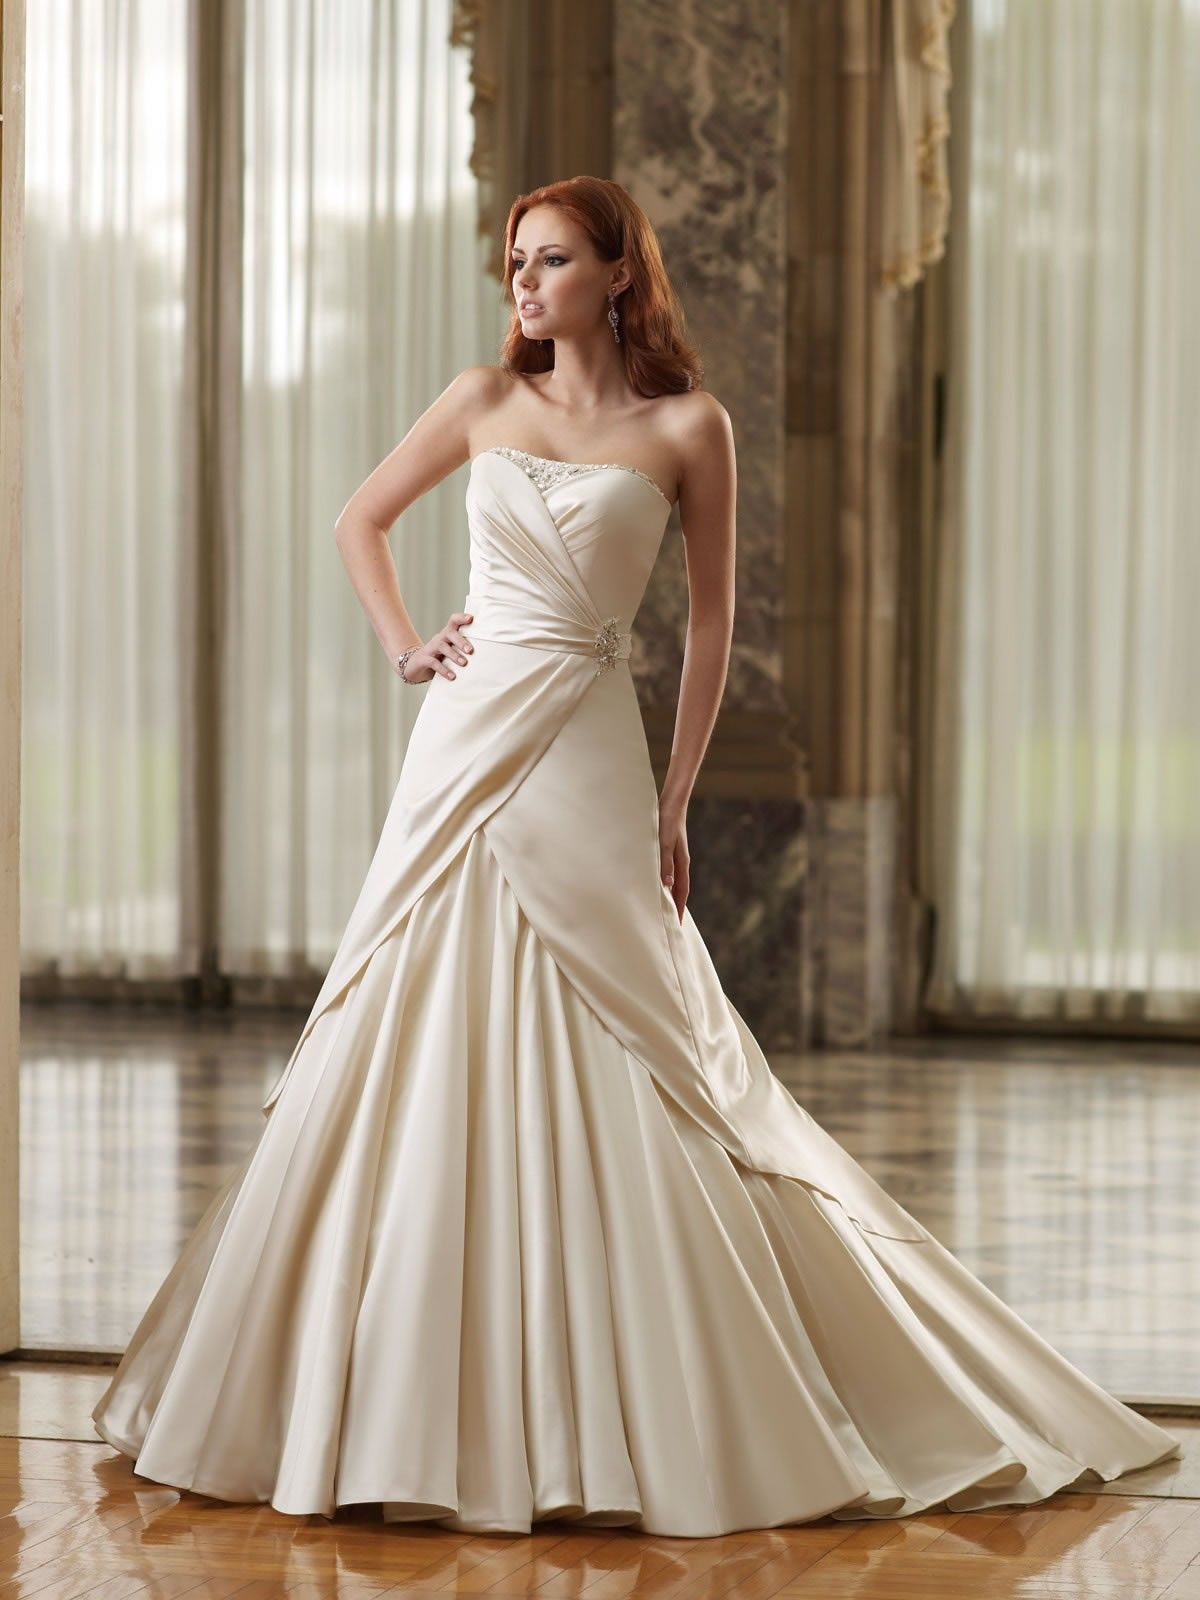 2015 Satin Softly Curved Neckline Aline Wedding Dress